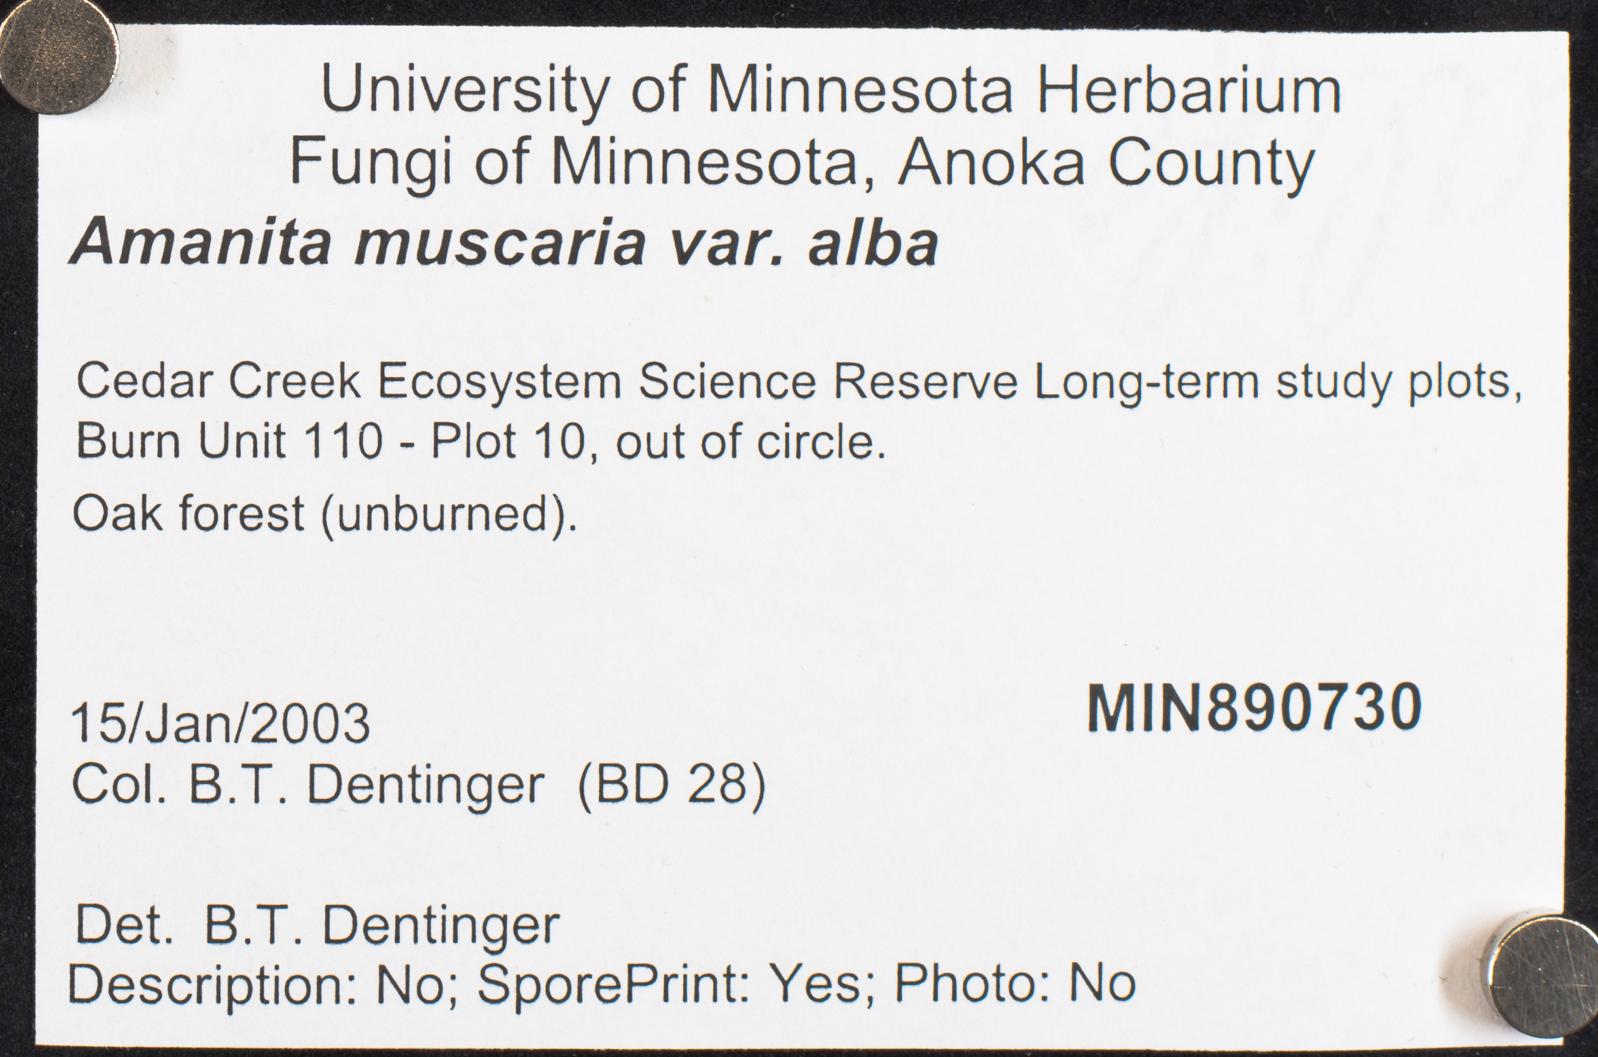 Amanita muscaria var. alba image